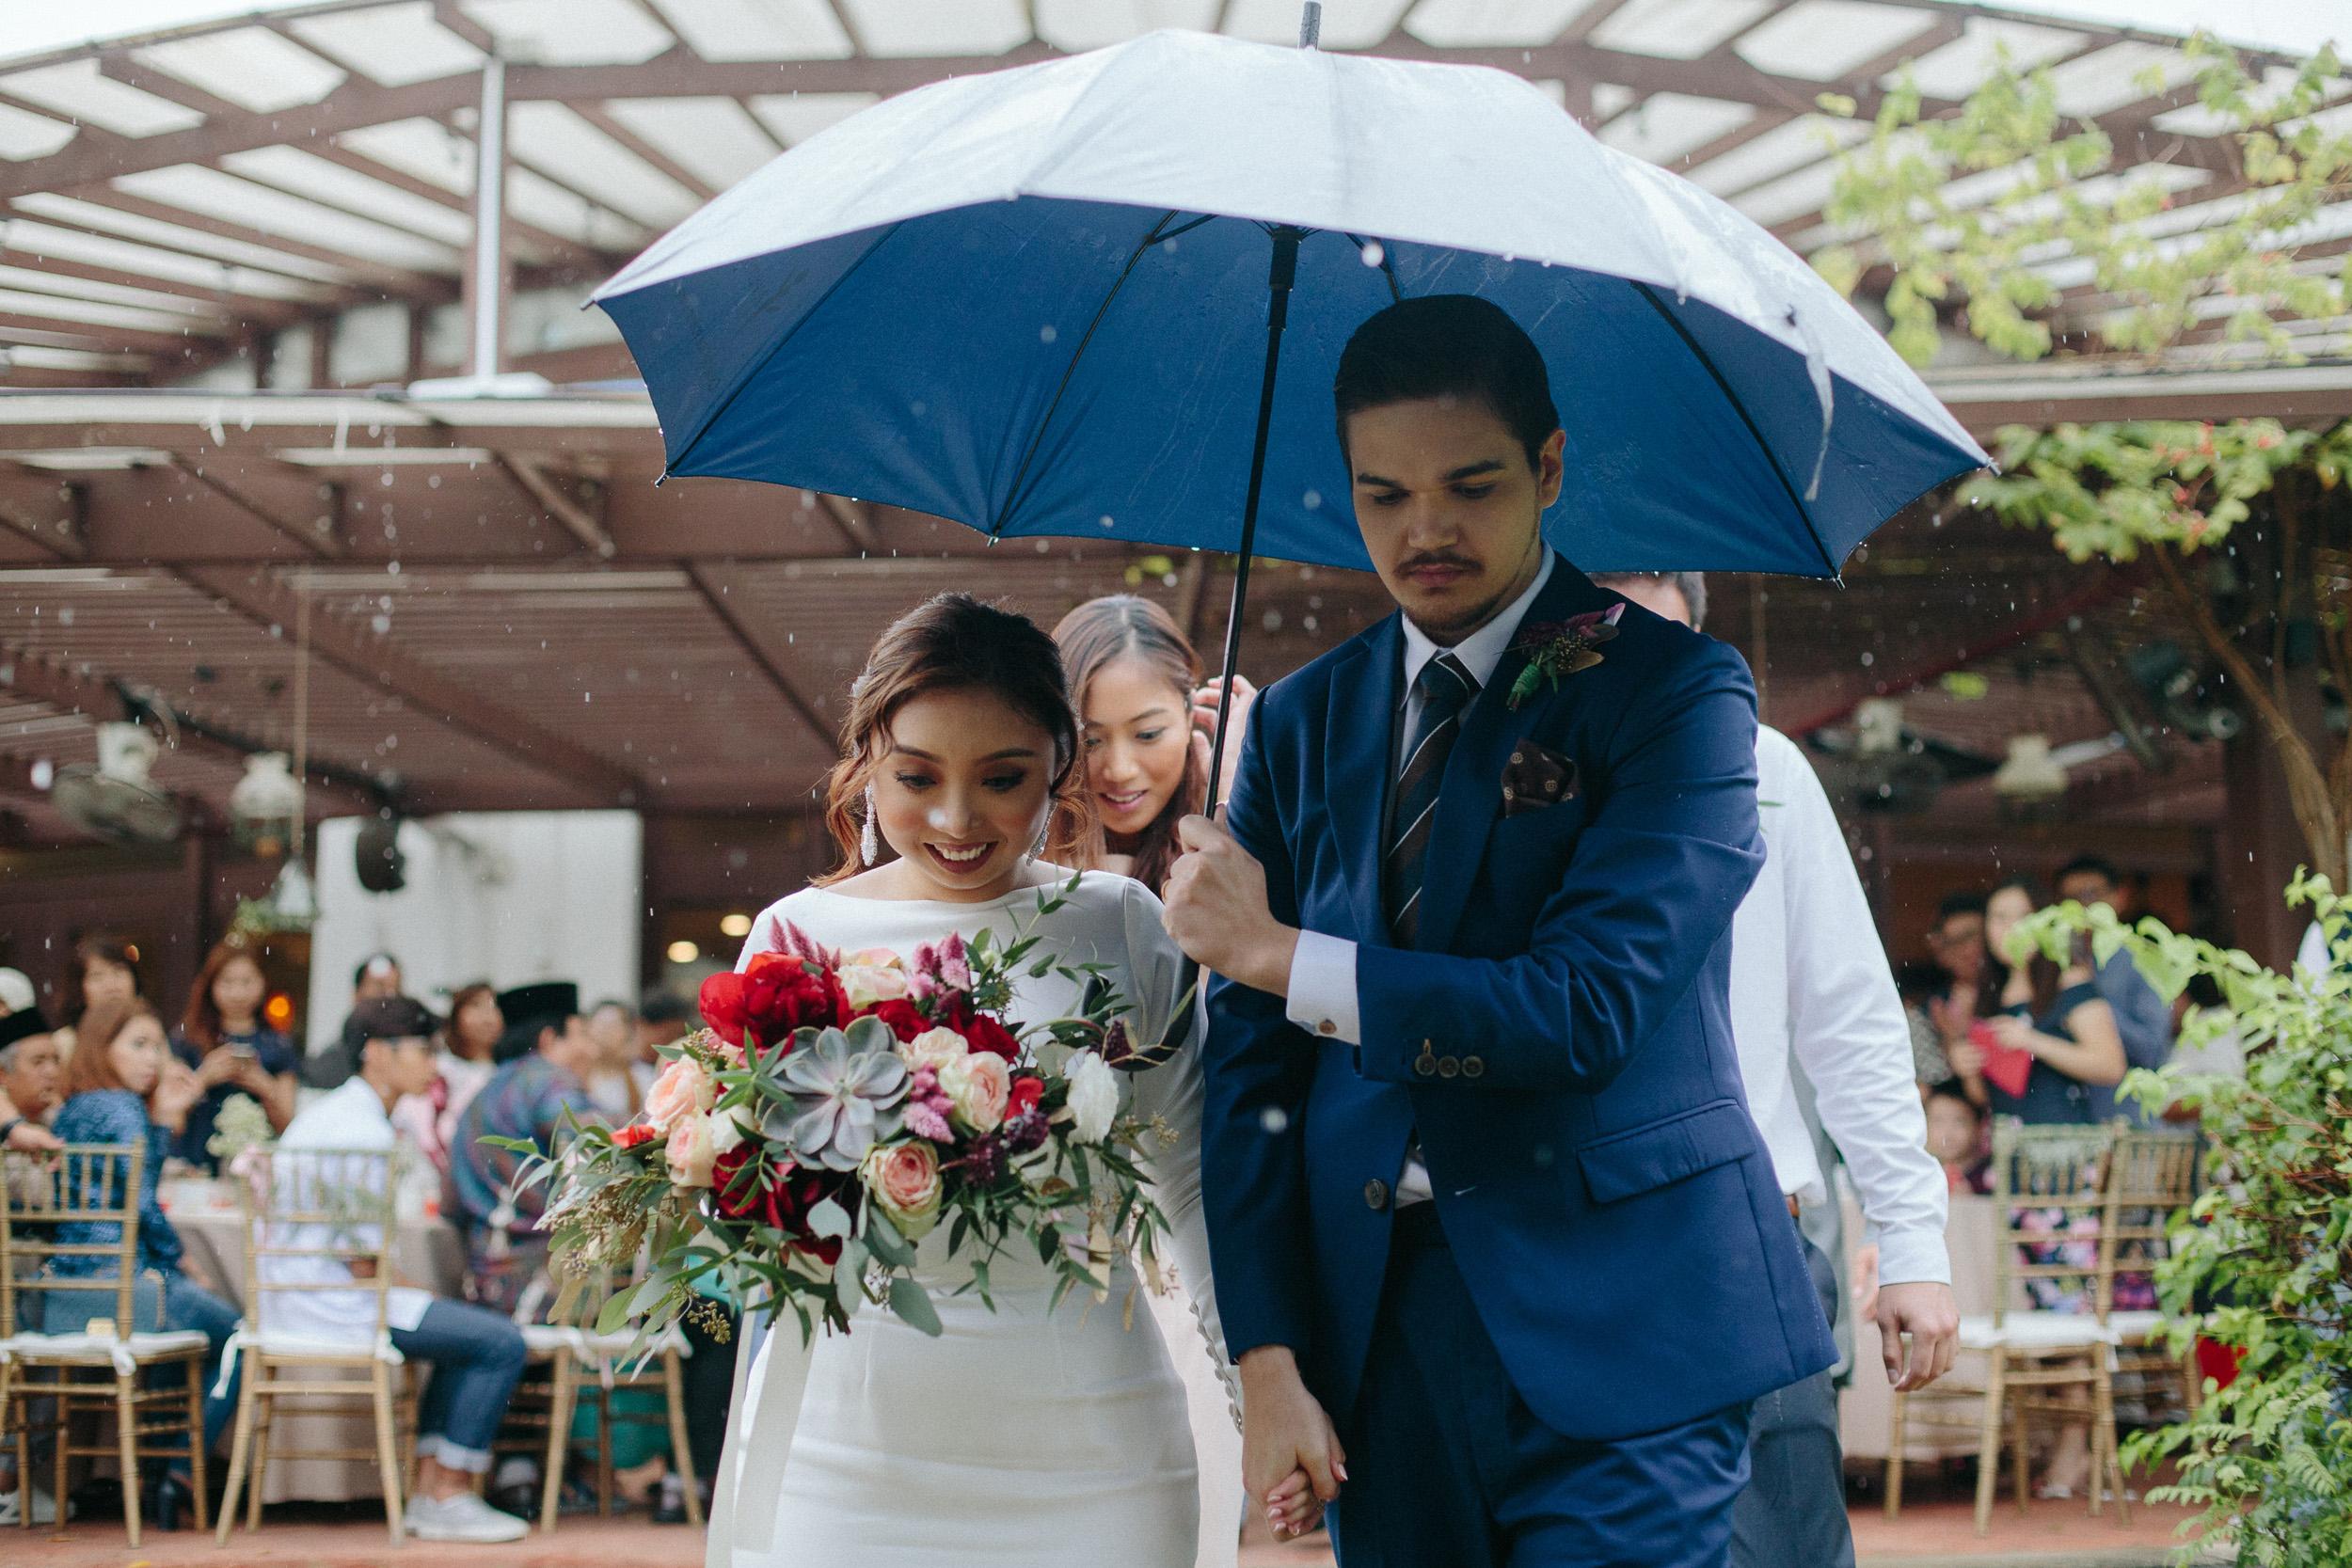 singapore-wedding-photographer-photography-wmt2017-118.jpg